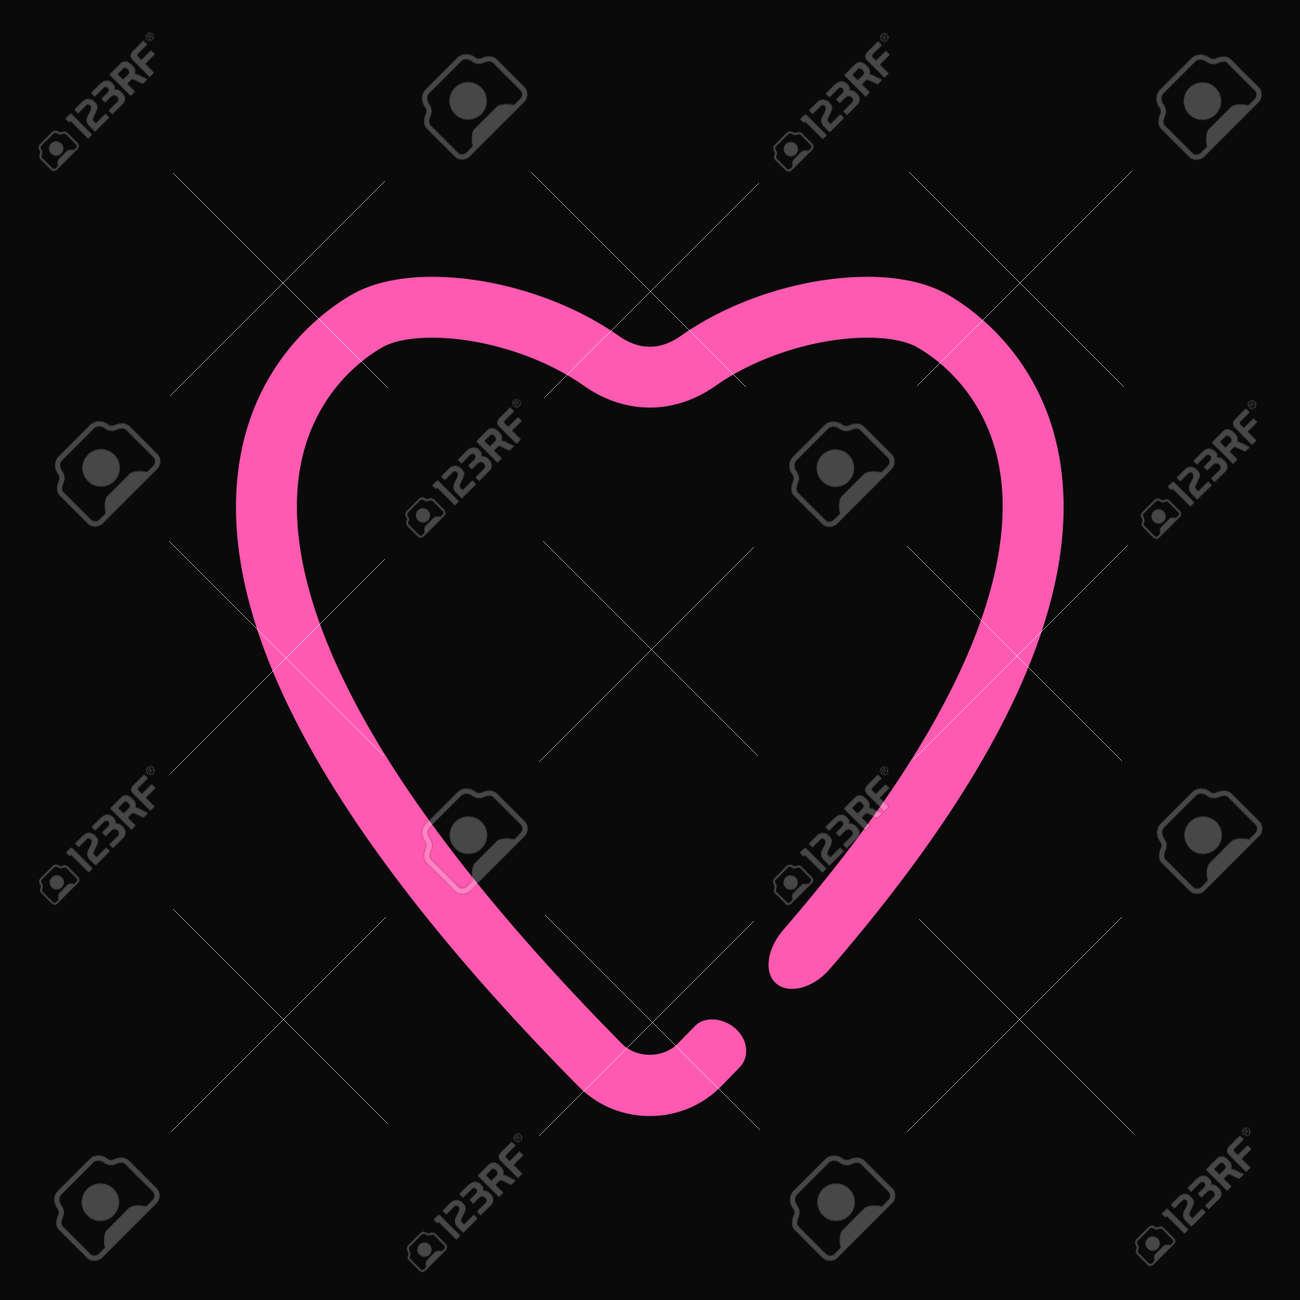 neon heart love symbol light design on the black wall vector